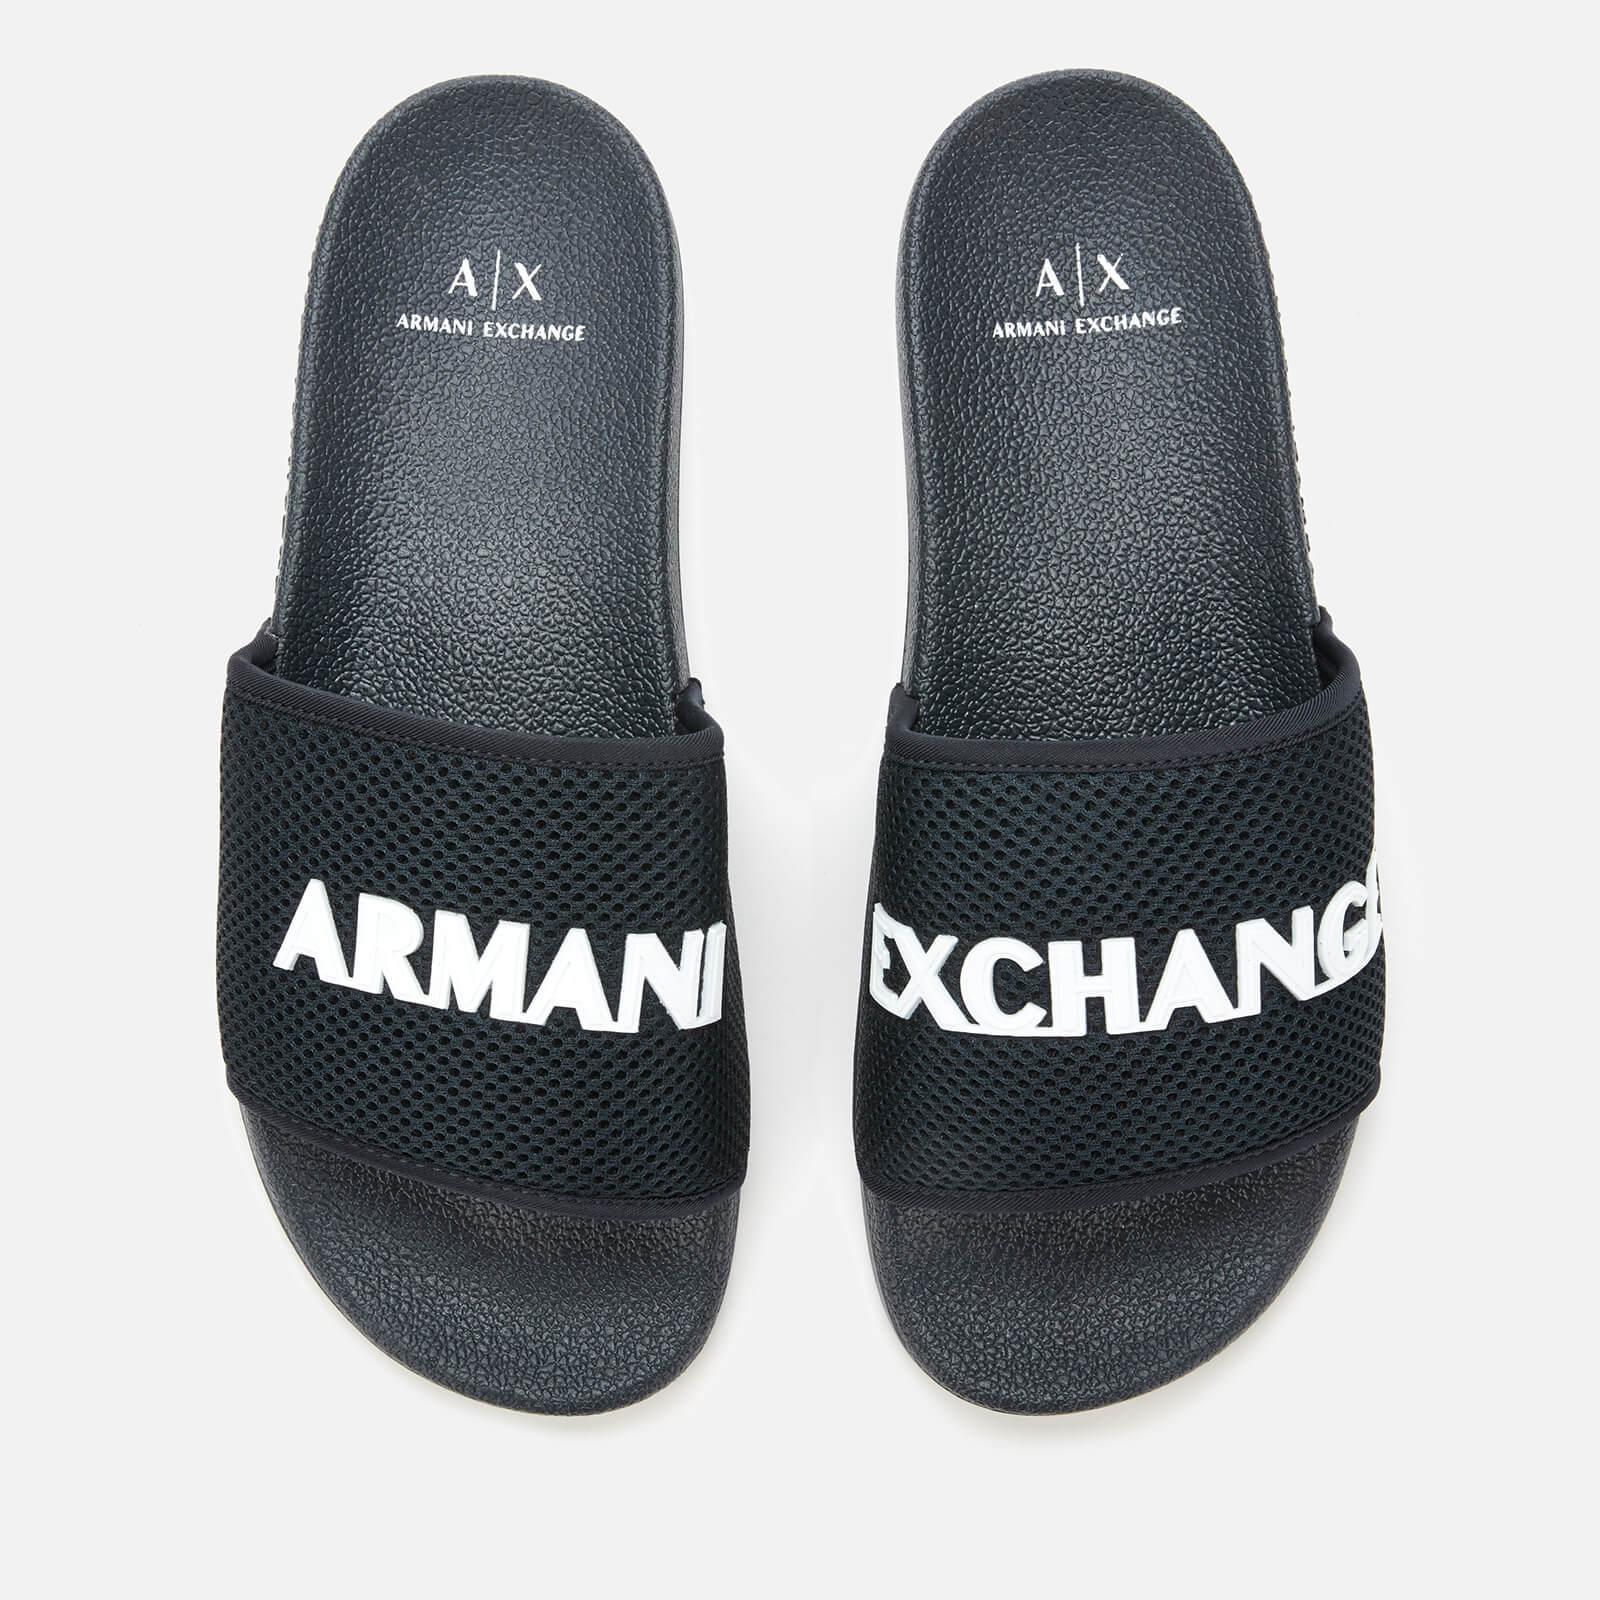 Armani Exchange Men's Slide Sandals - Blue/Optical White - UK 11